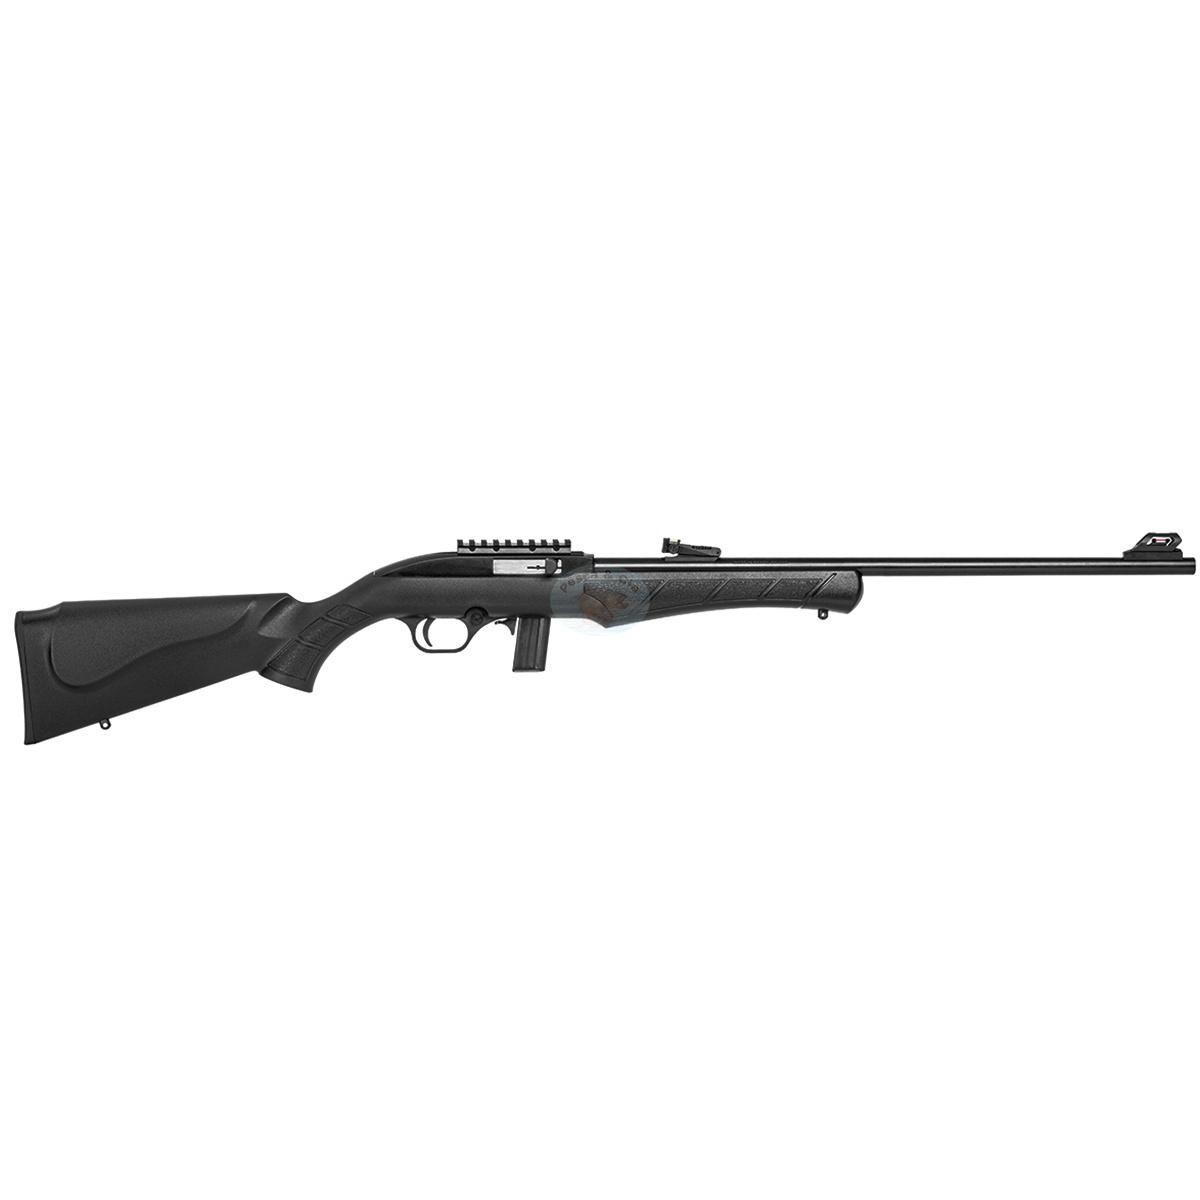 "Rifle CBC Semi-Automático 7022 Standard Cal. .22LR Oxidado Nylon - 21""  + **LUNETA BRINDE**"